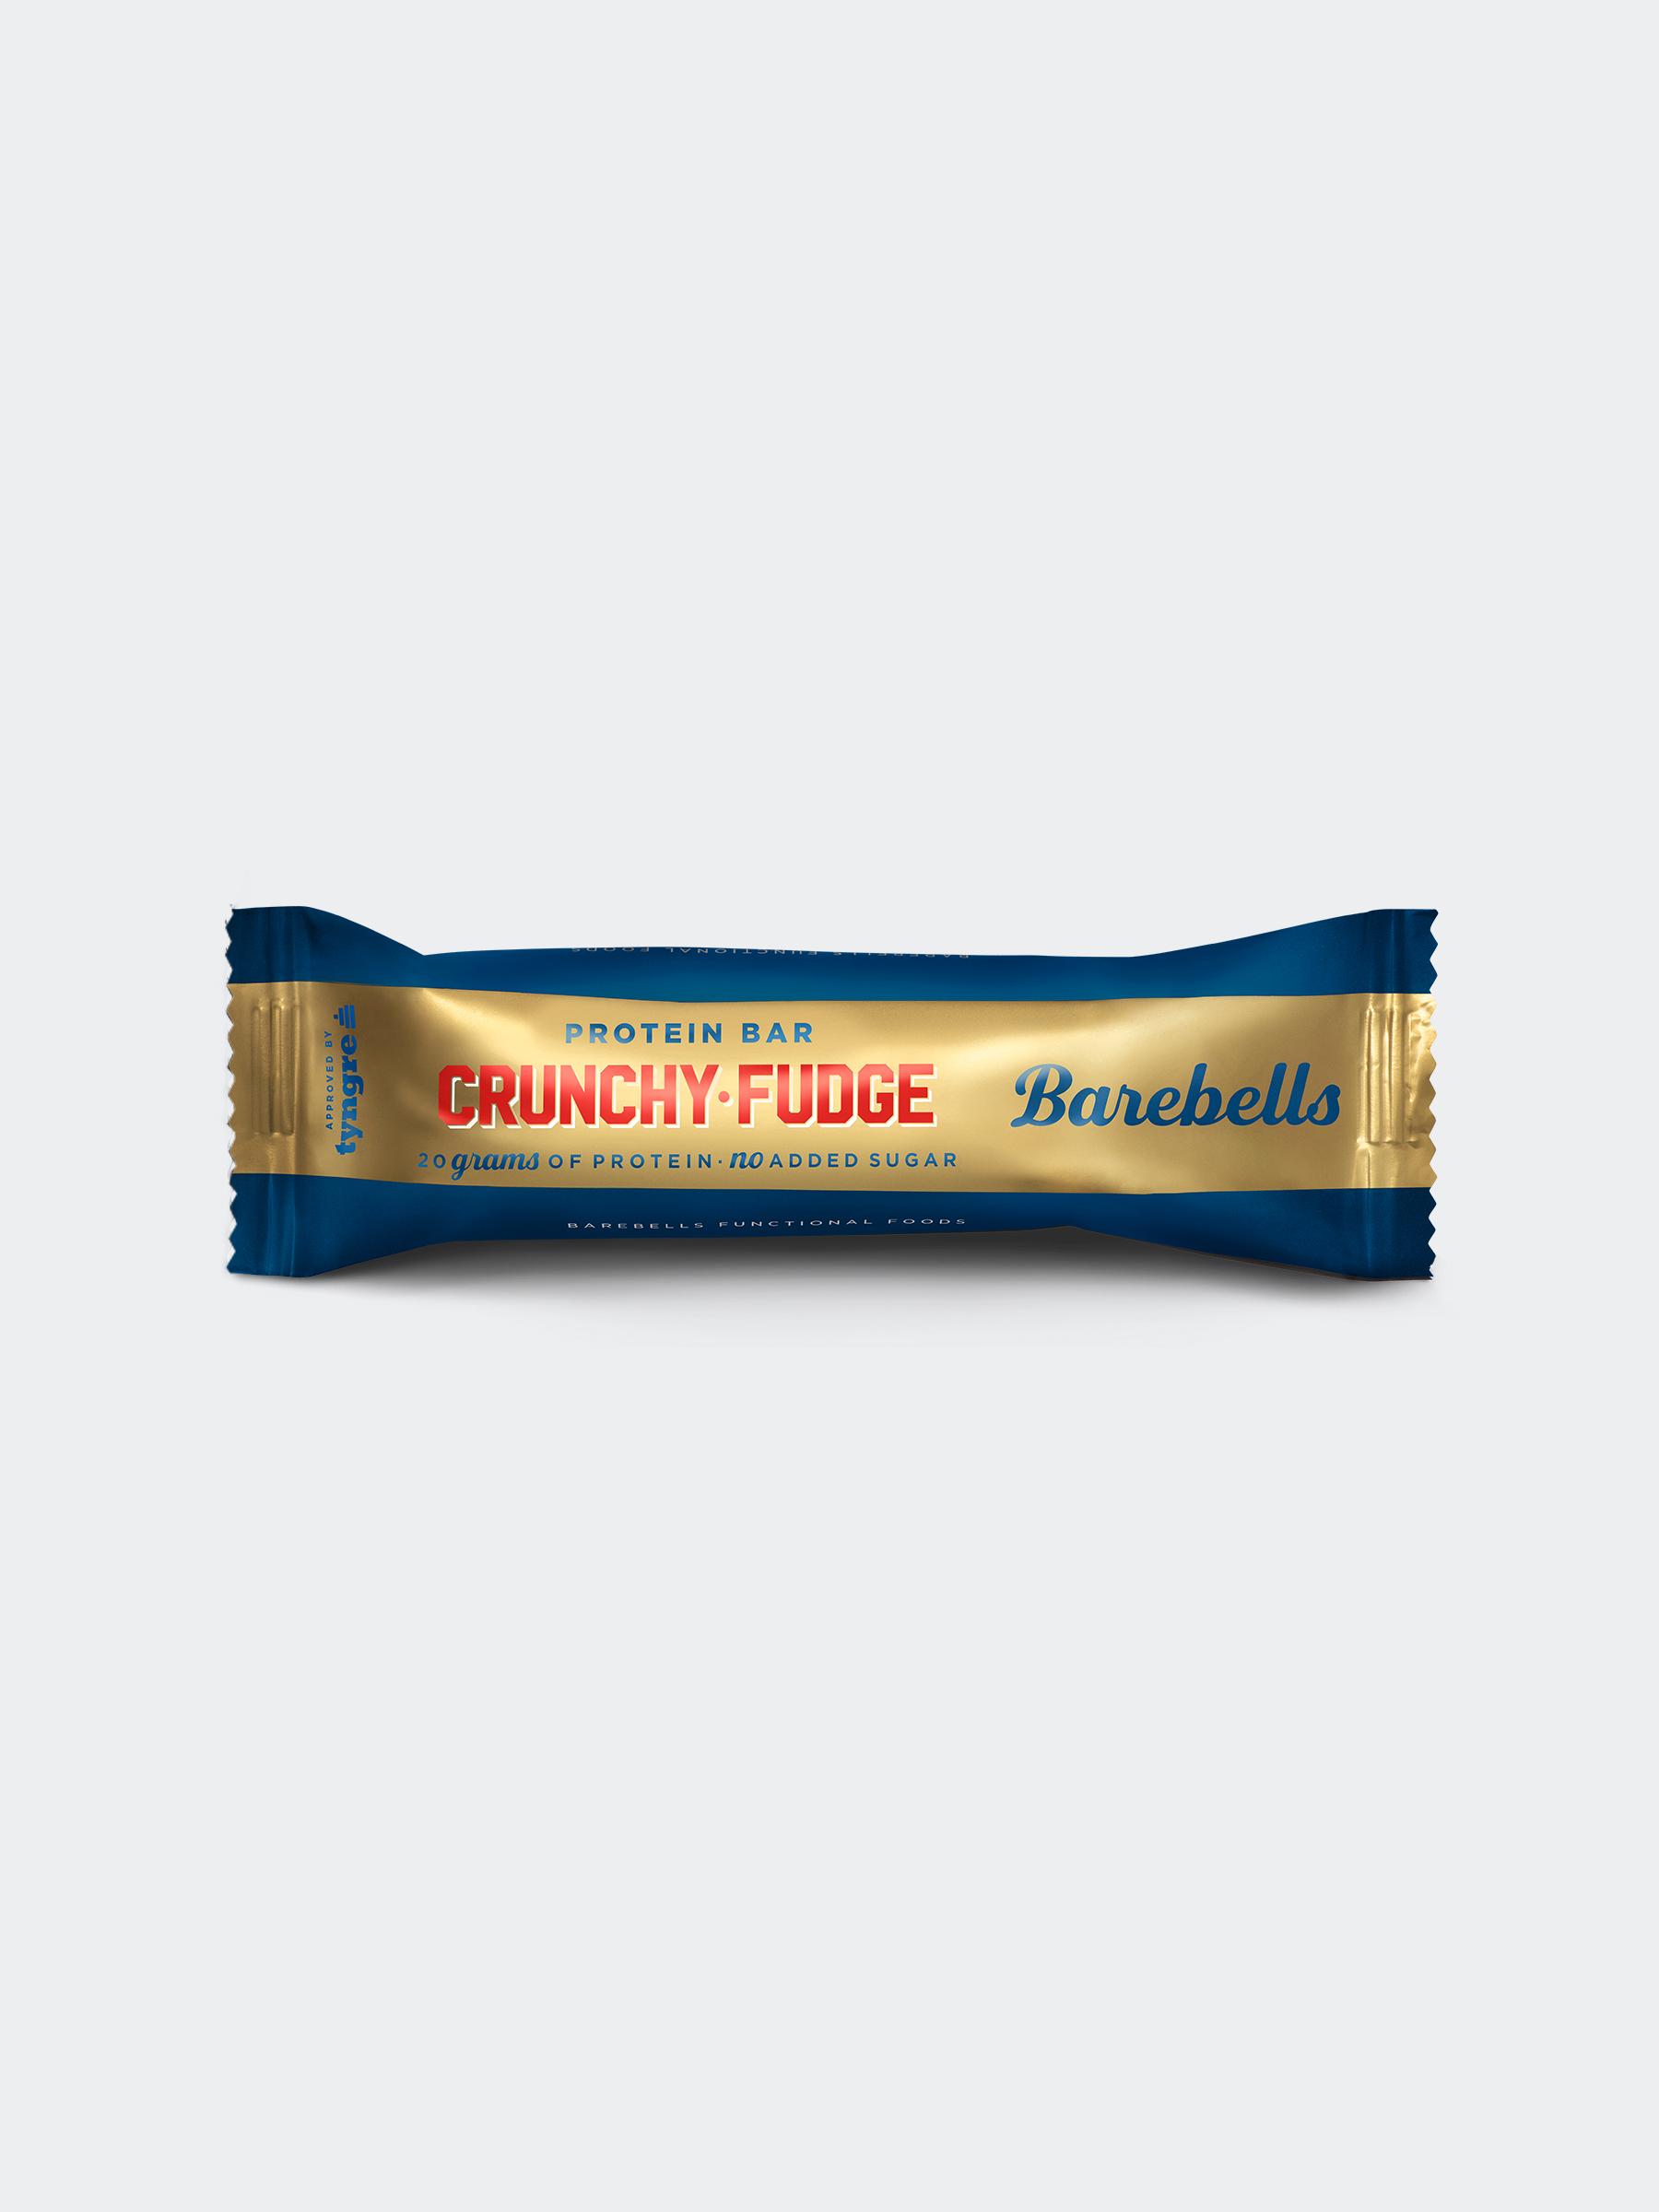 Barebells Crunchy Fudge